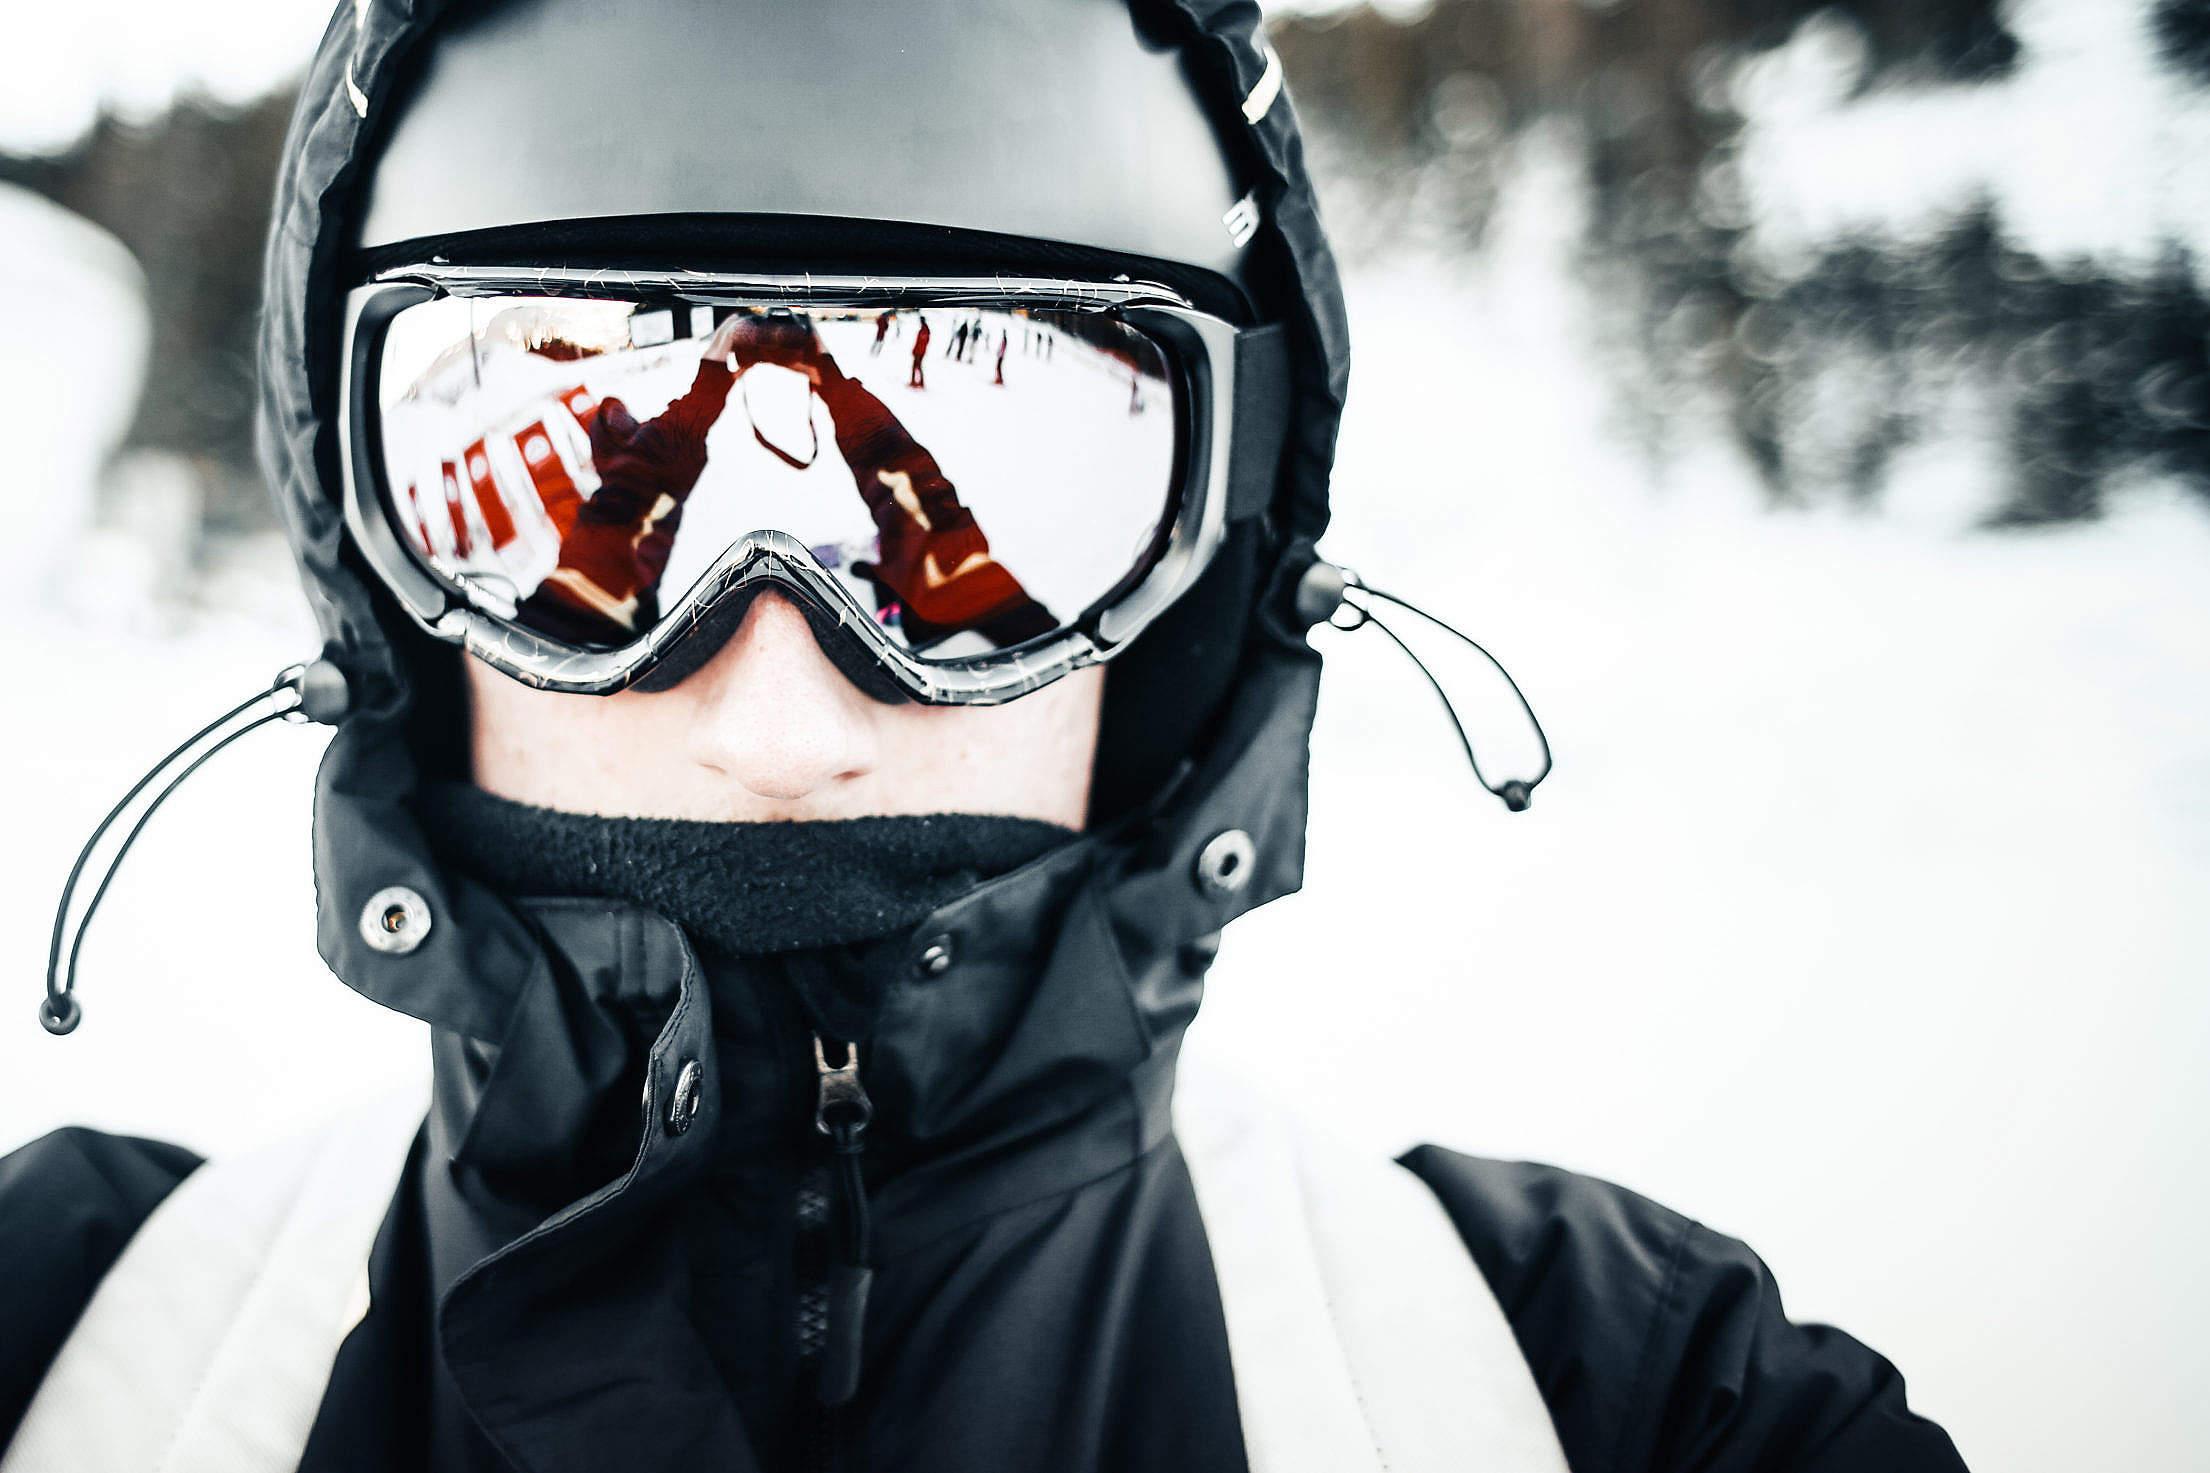 Skier Portrait Free Stock Photo